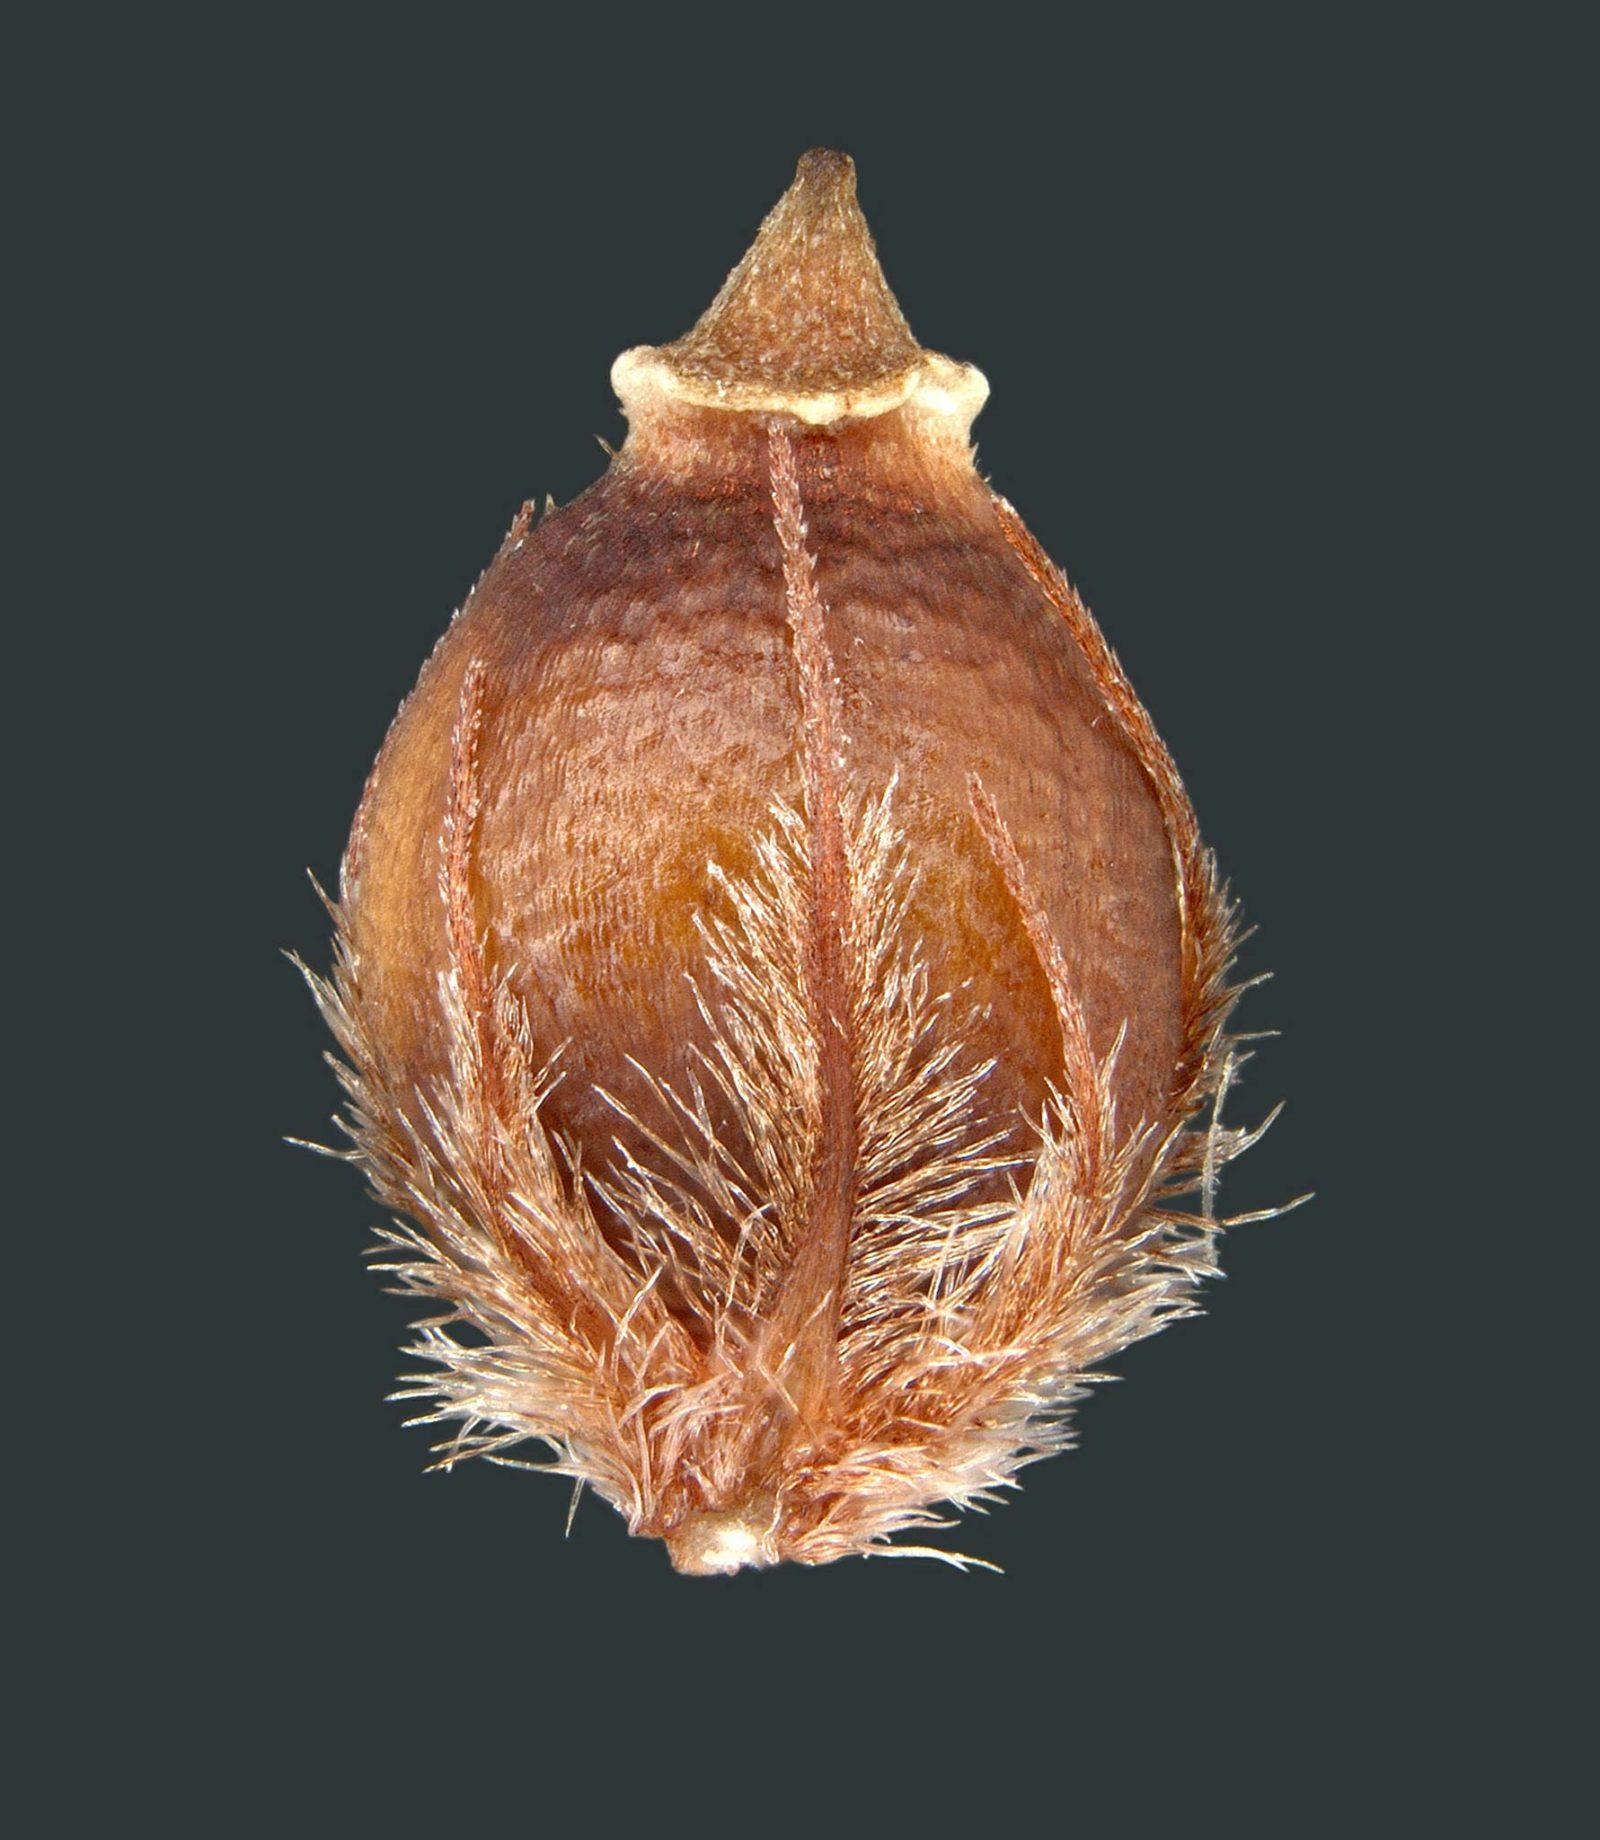 Achene  Or Fruit  Of A Beak